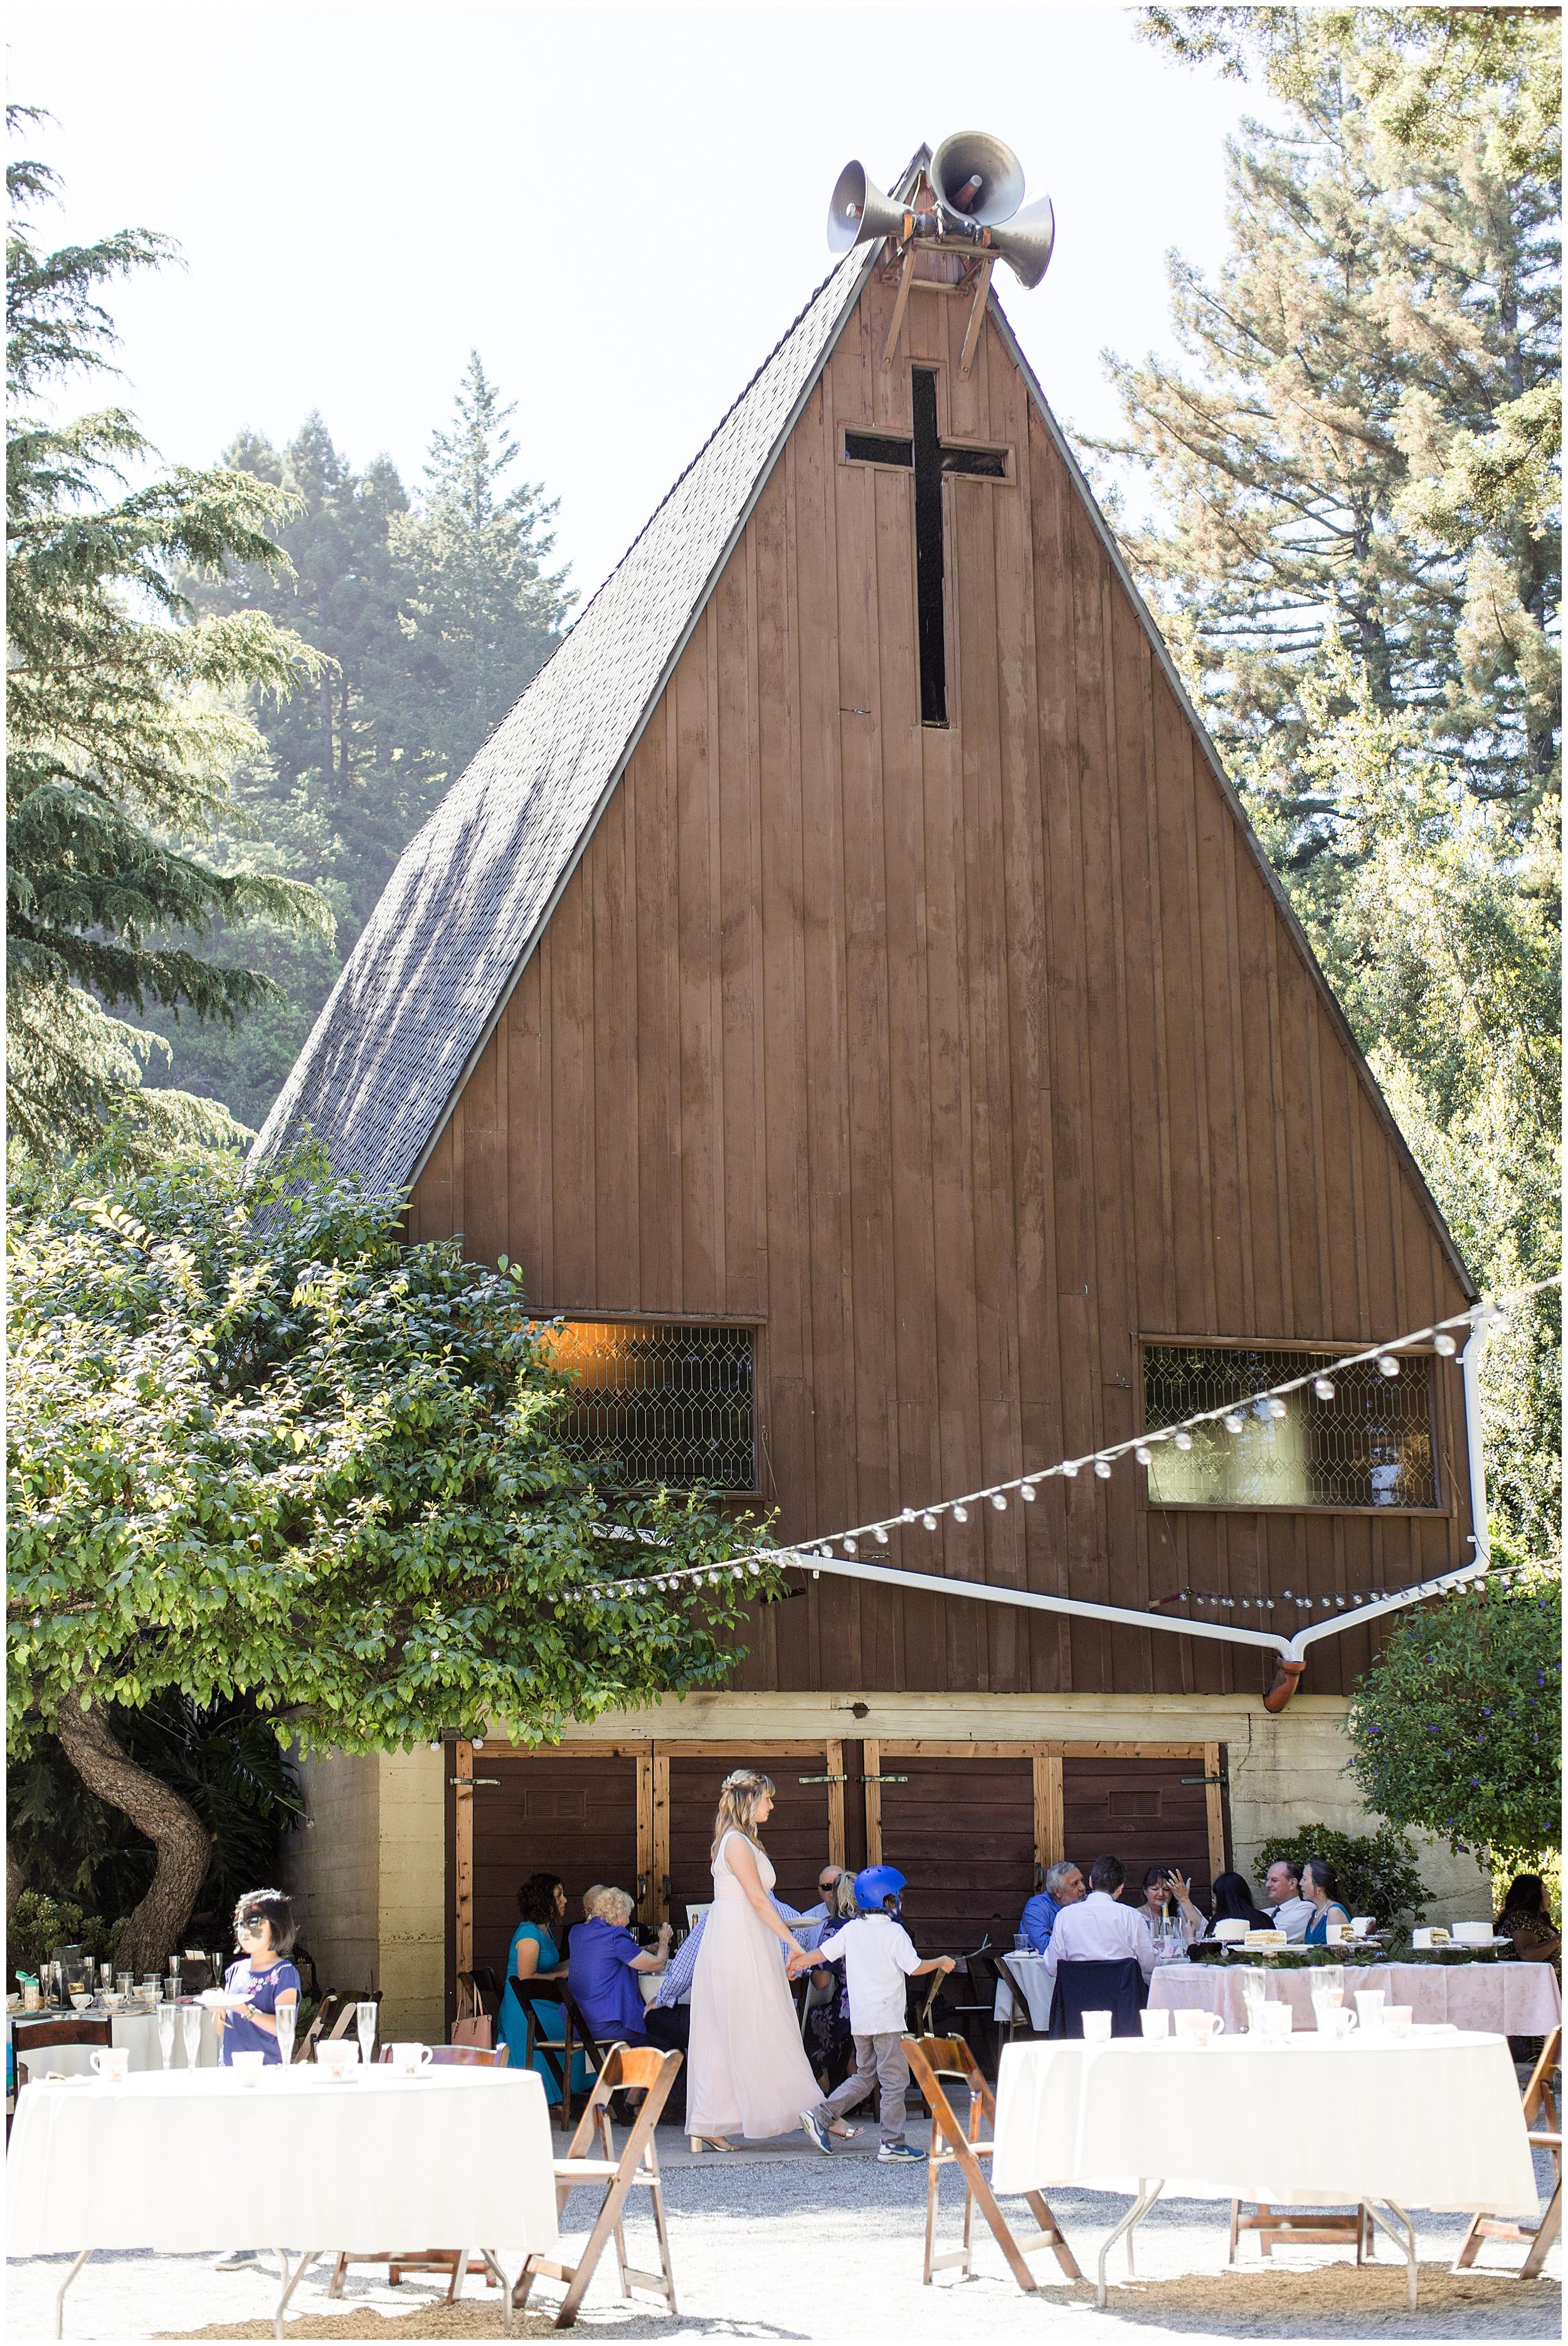 2019 chapel on the hill los gatos san jose bay area wedding photographer angela sue photography_0062.jpg